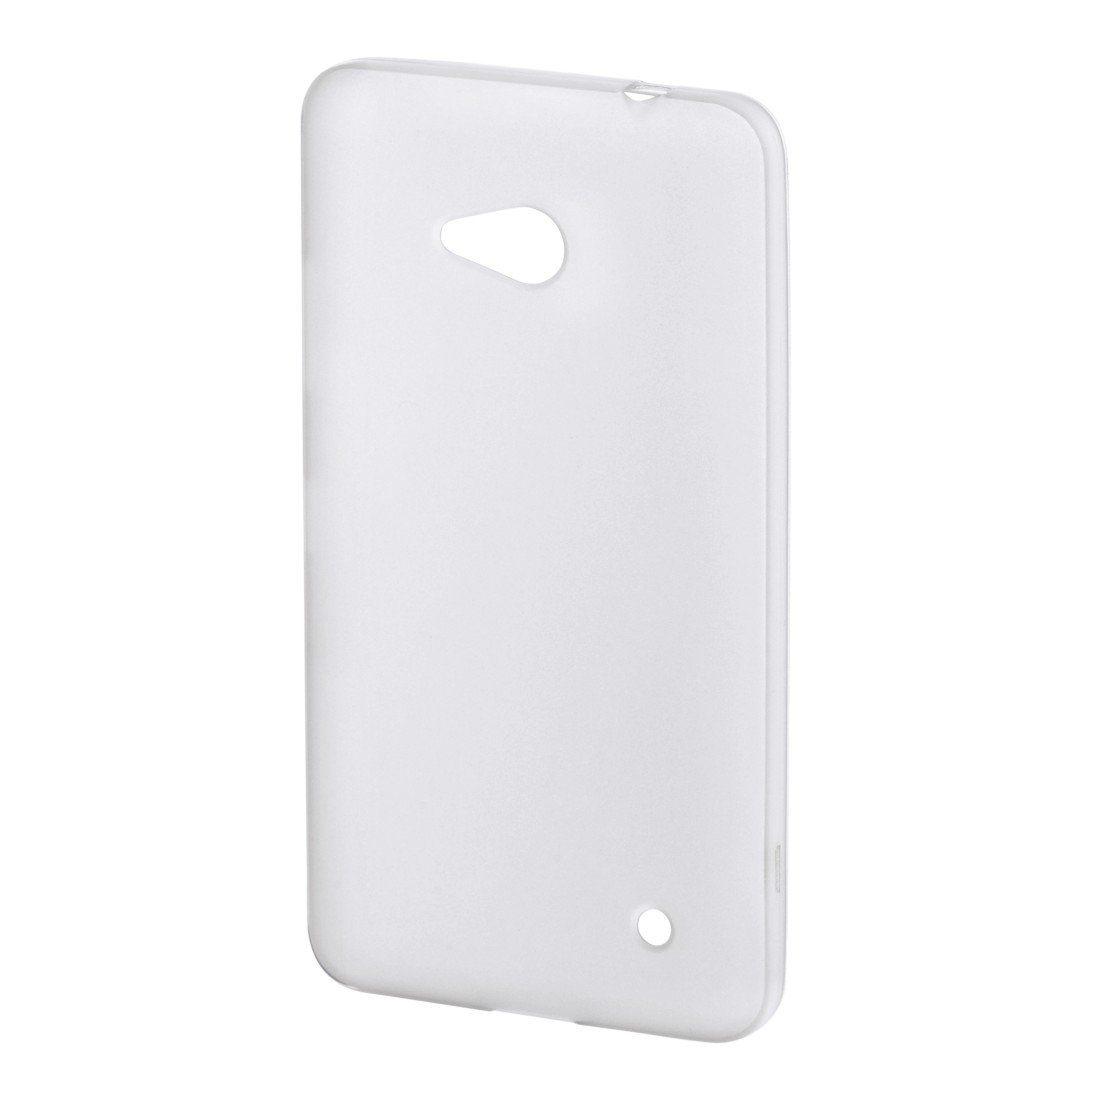 Hama Cover Crystal für Microsoft Lumia 640, Transparent